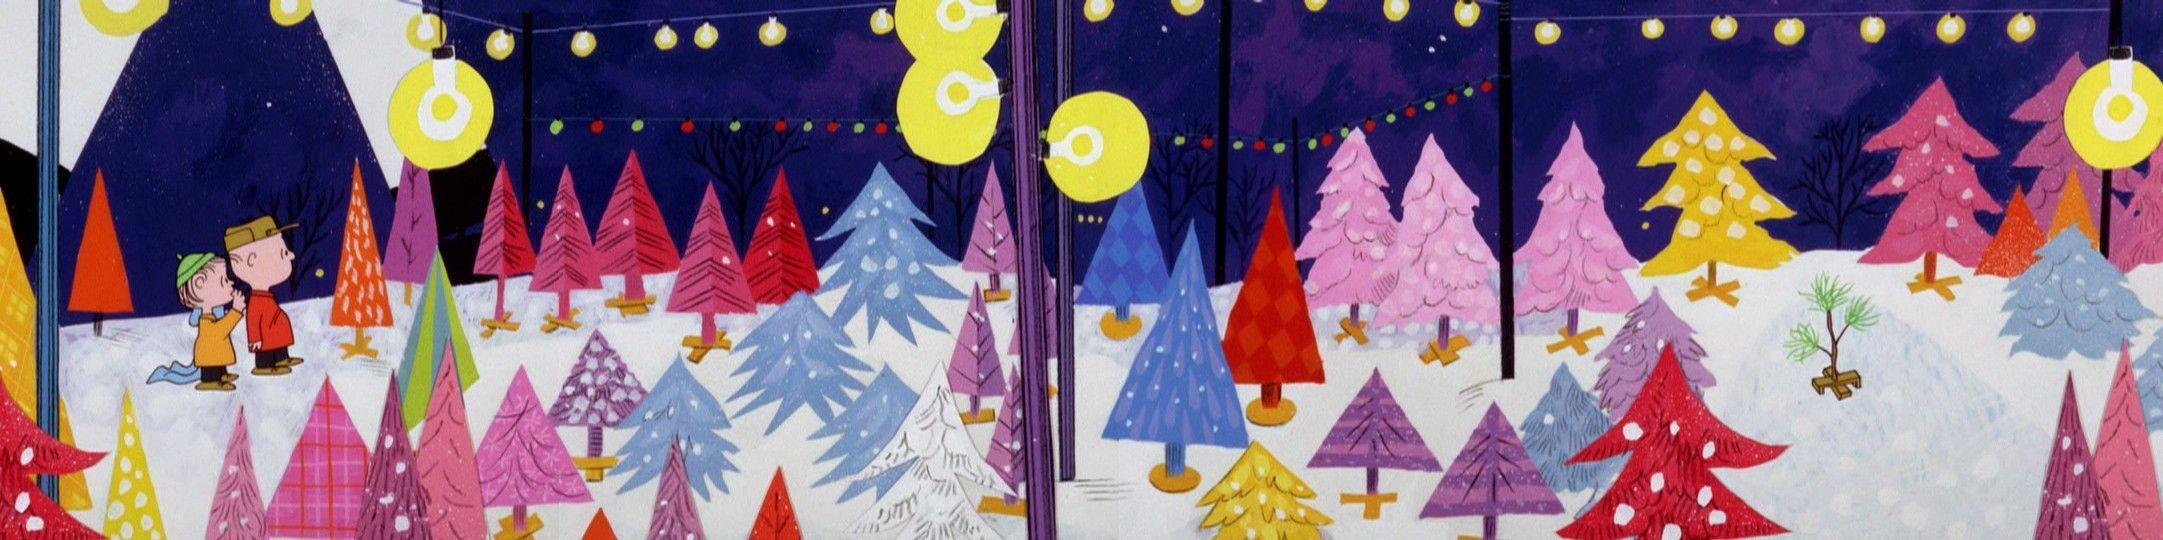 Peanuts Christmas Wallpapers Wallpaper Cave